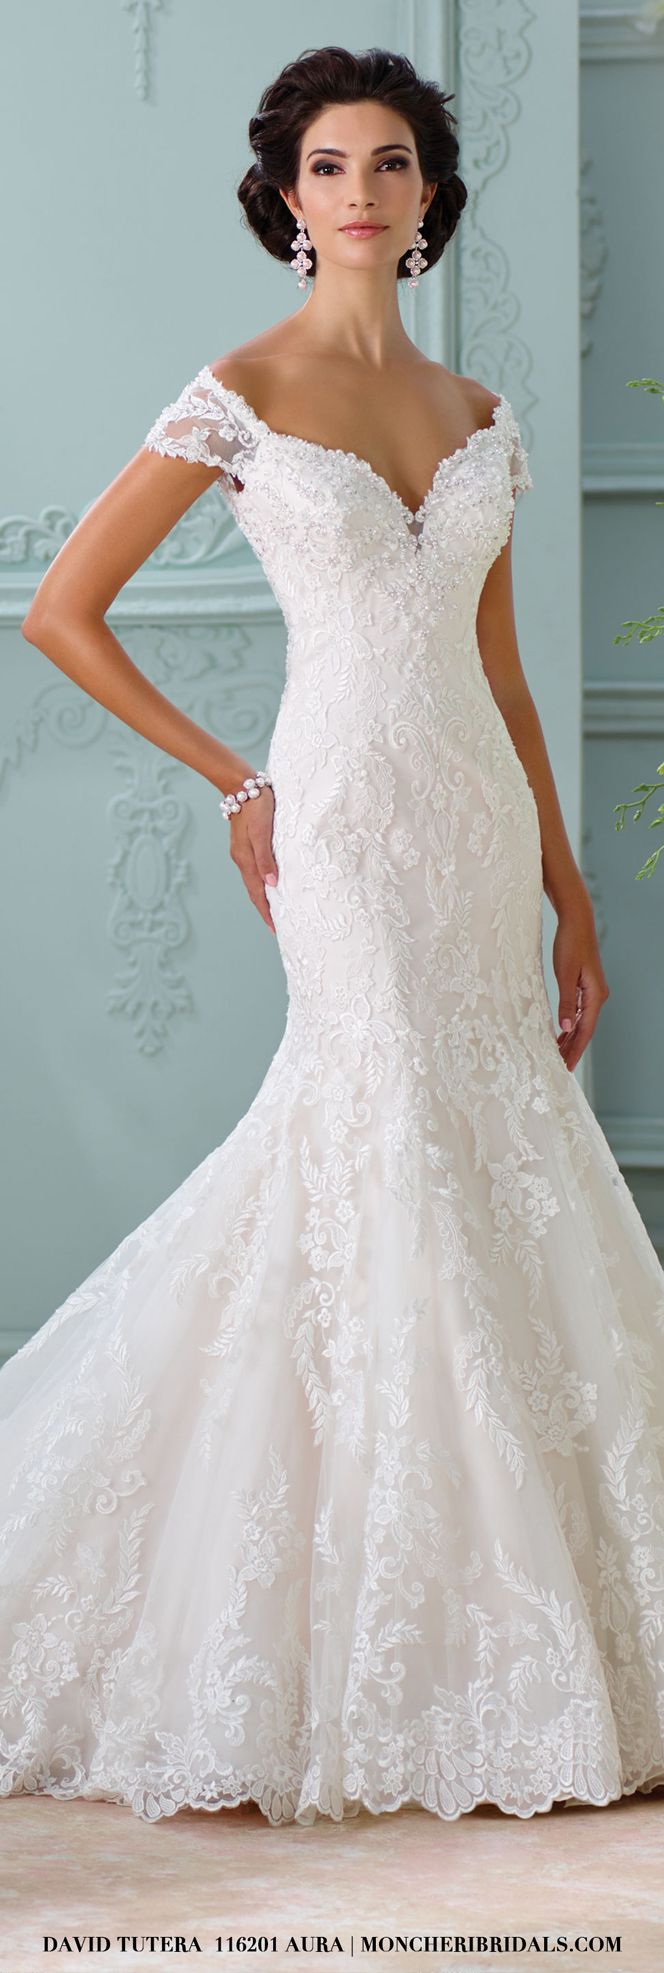 116201 – Aura. Off the shoulder Venise lace wedding dress by David Tutera for Mon Cheri.  In depth details & more photos can be found at moncheribridals.com #laceweddingdresses